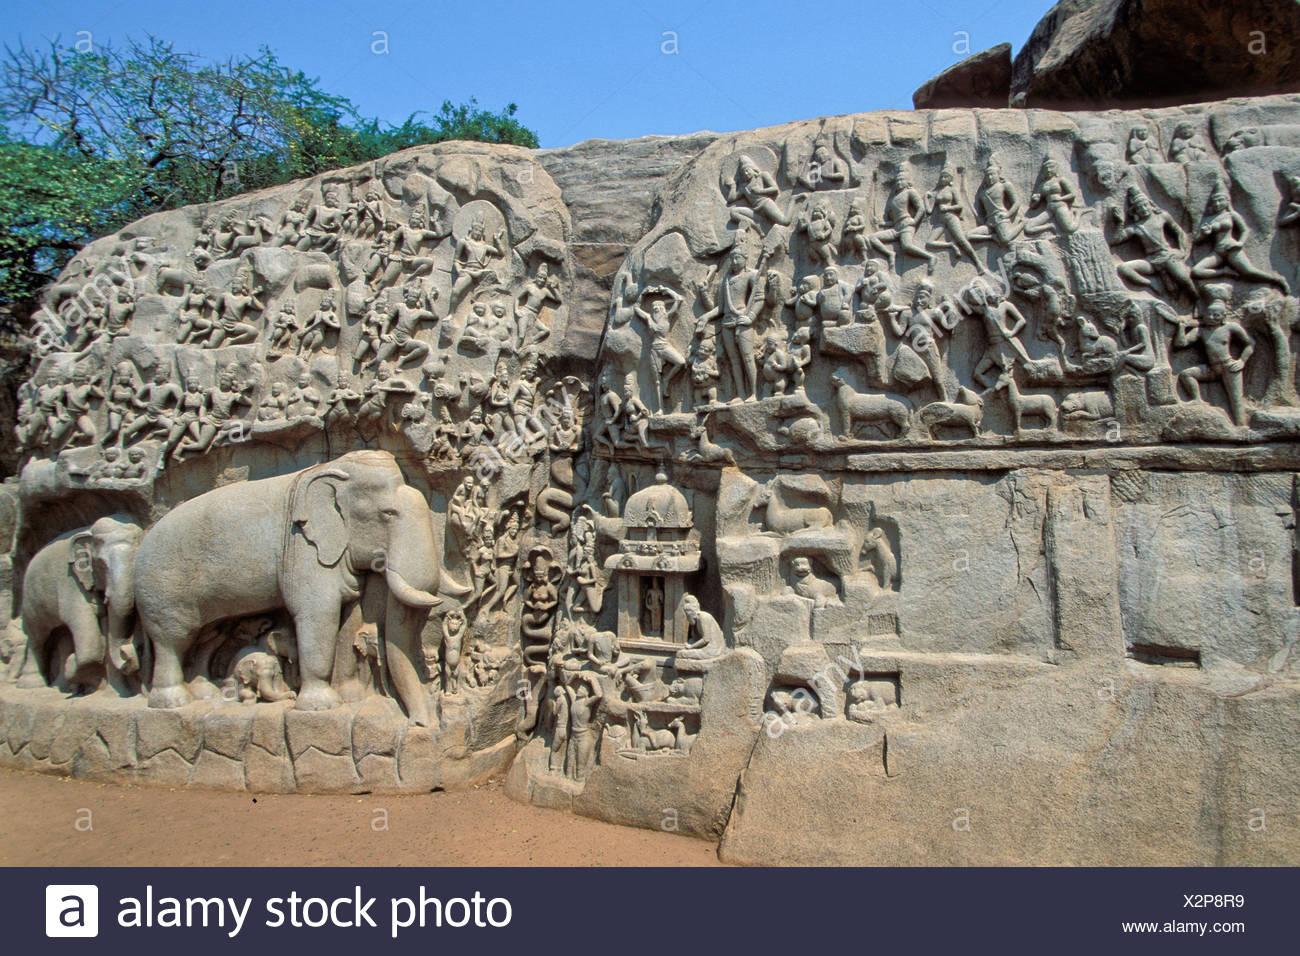 Bajorrelieve del descenso del Ganges o Arjuna la penitencia, Mahabalipuram o Mamallapuram, Tamil Nadu, India del Sur, India, Asia Imagen De Stock